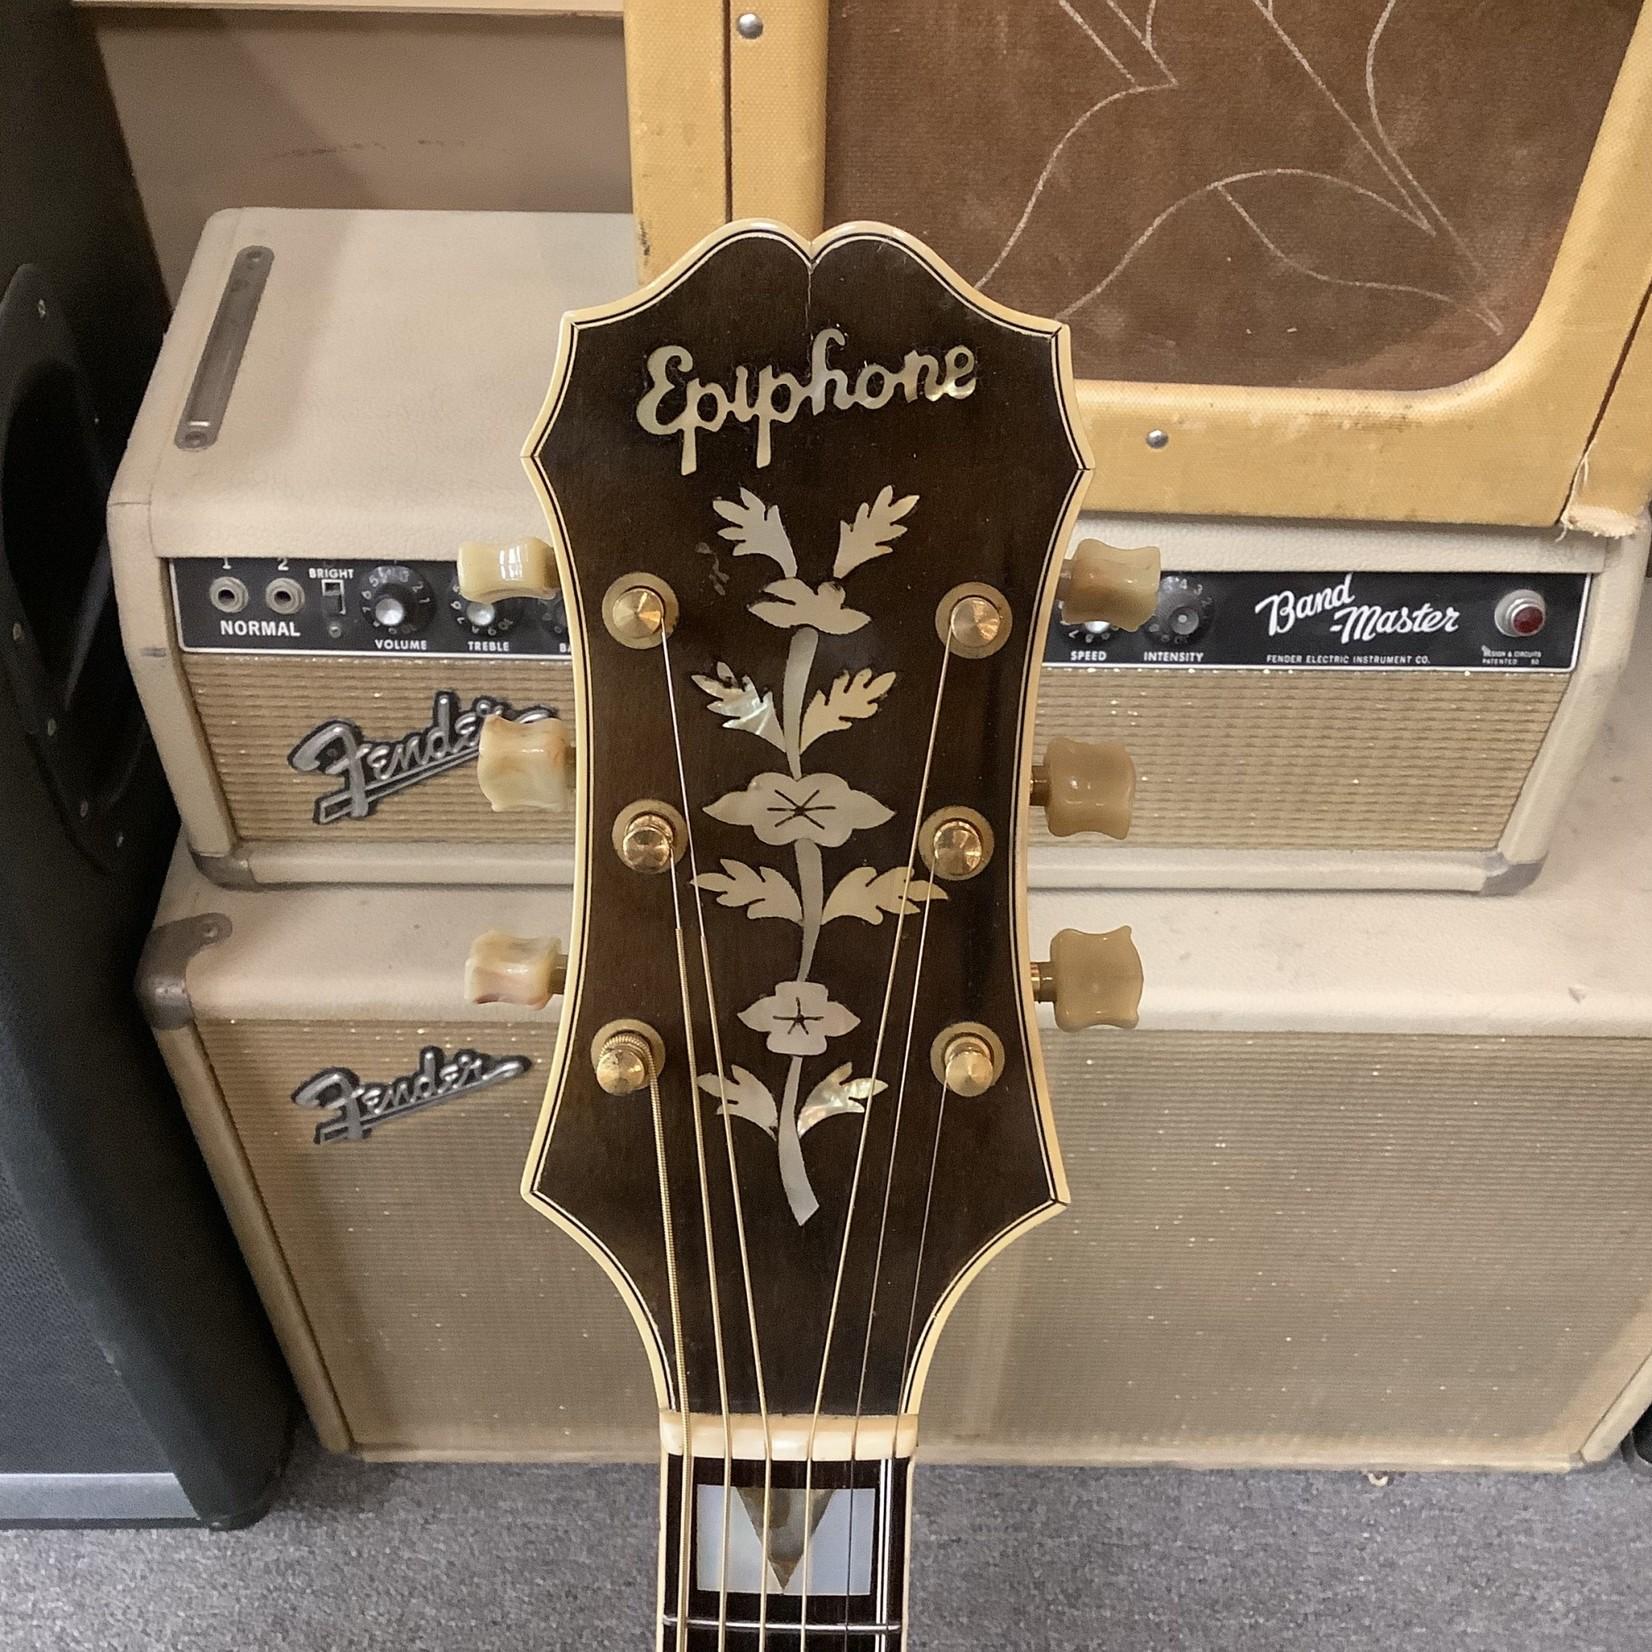 Epiphone 1951 Epiphone Emperor Blonde Cutaway